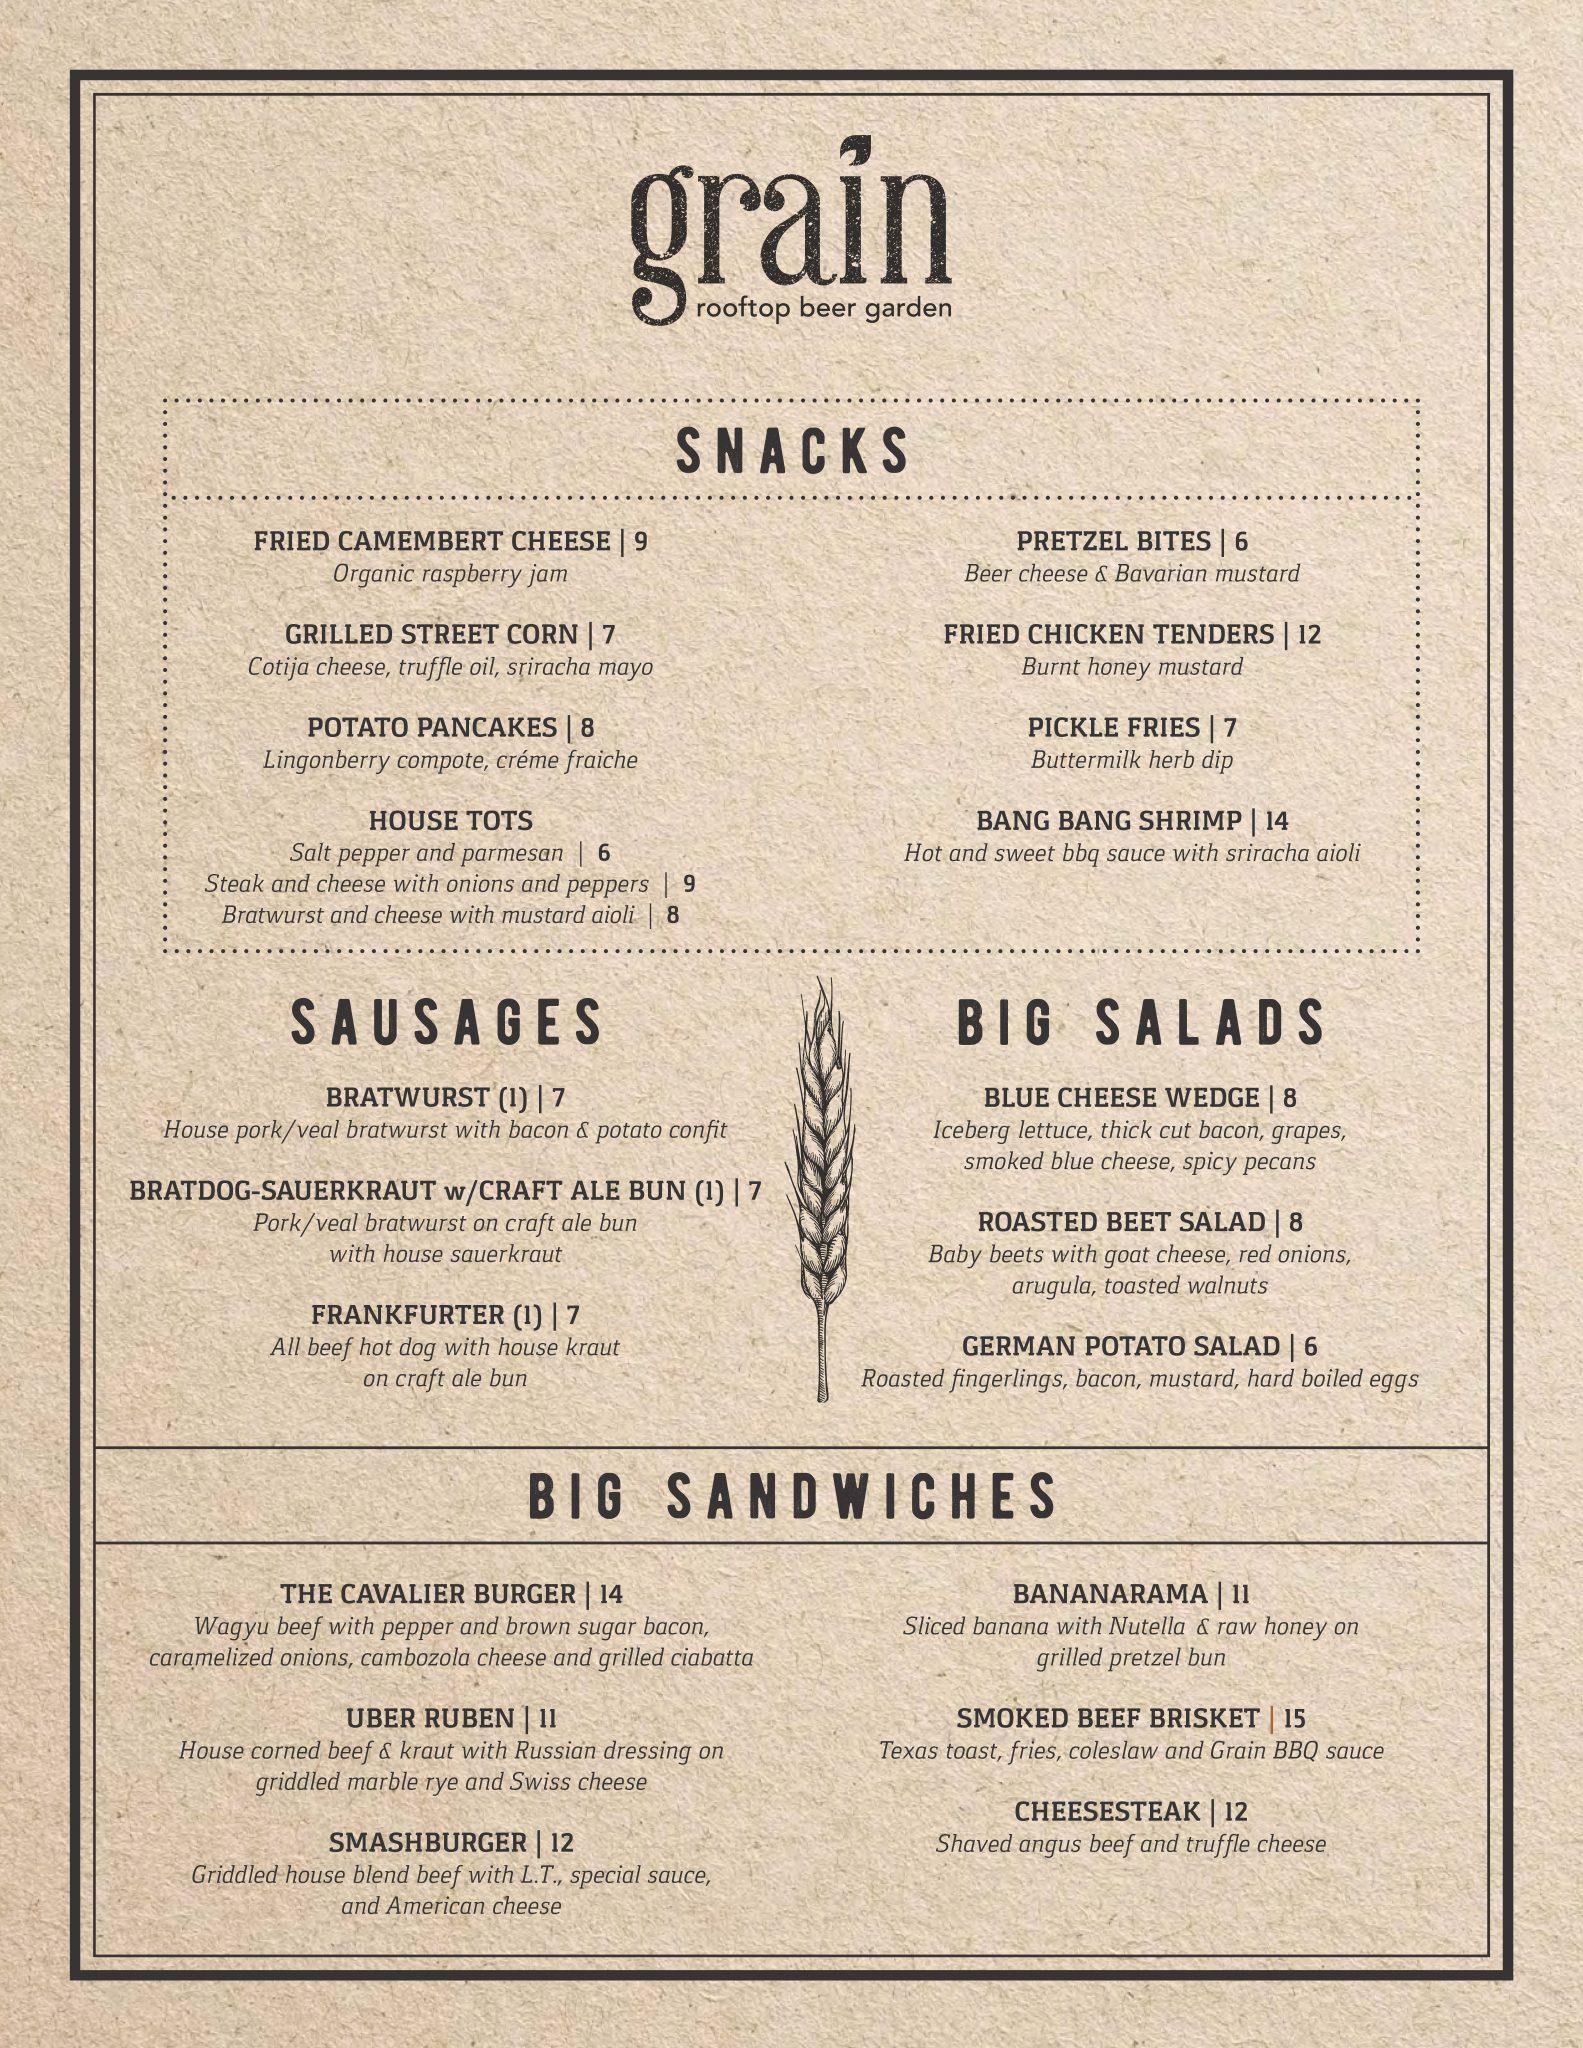 GRAIN_4184 Dinner Menu_5-2-18_web_Page_1